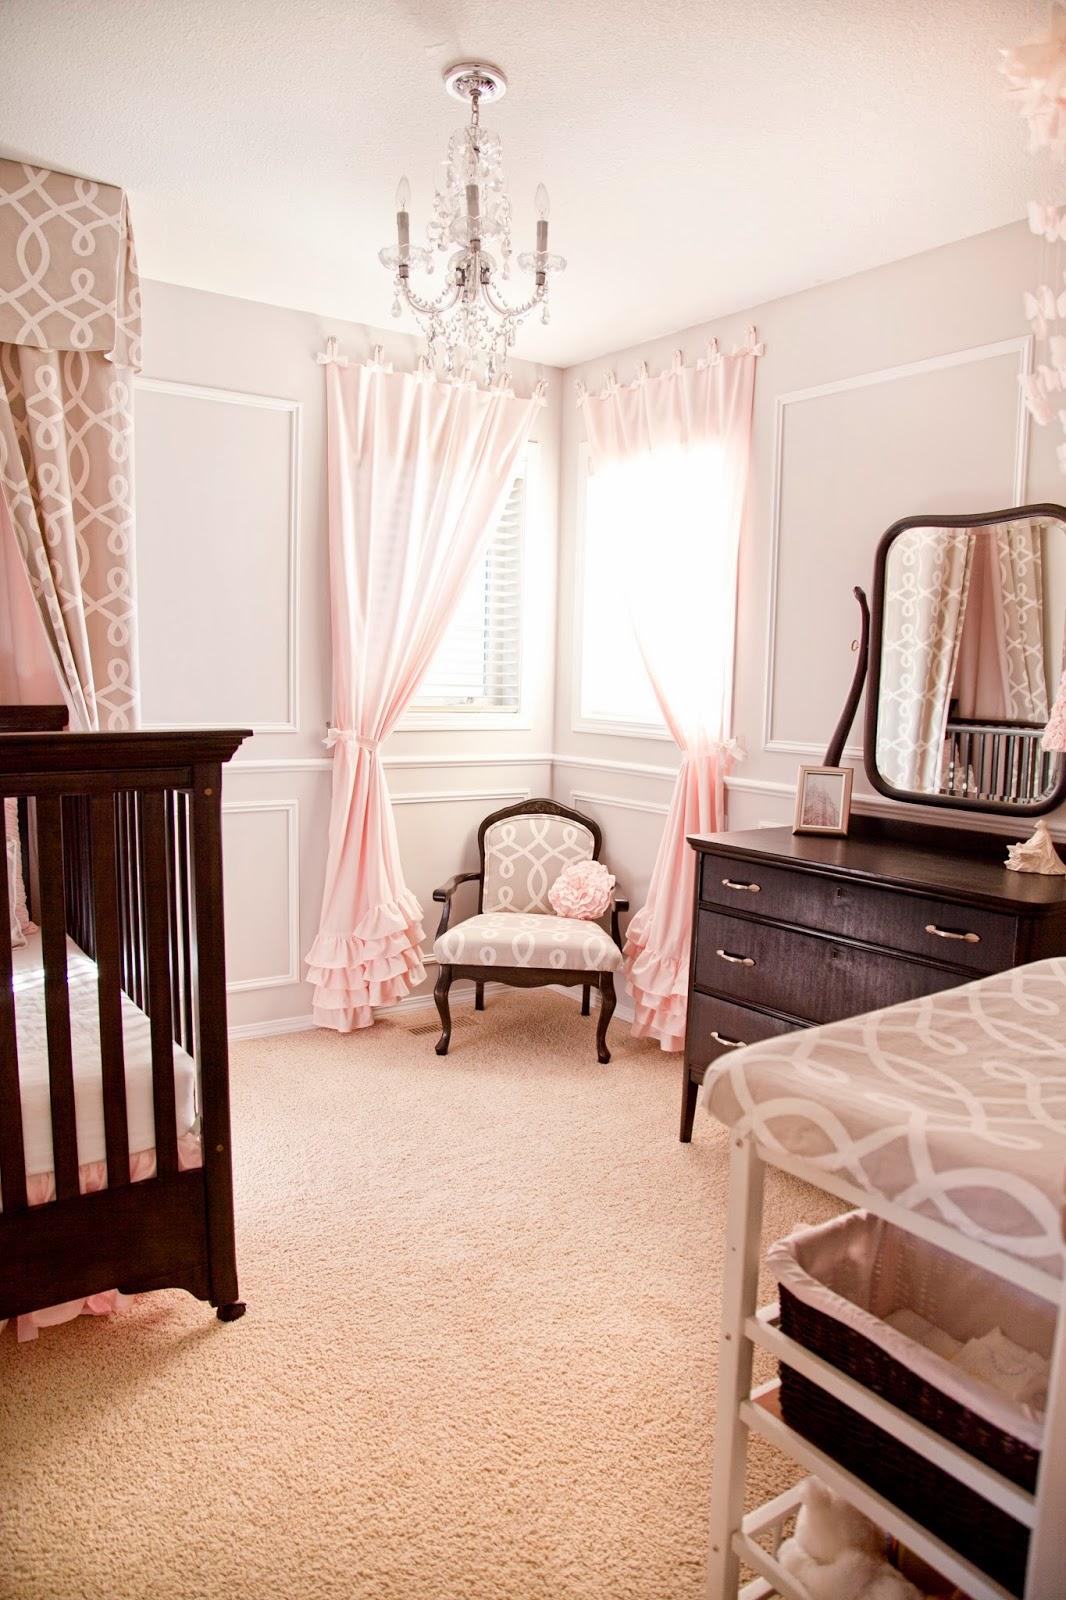 D i y d e s i g n diy nursery in pink grey for Baby room wall ideas